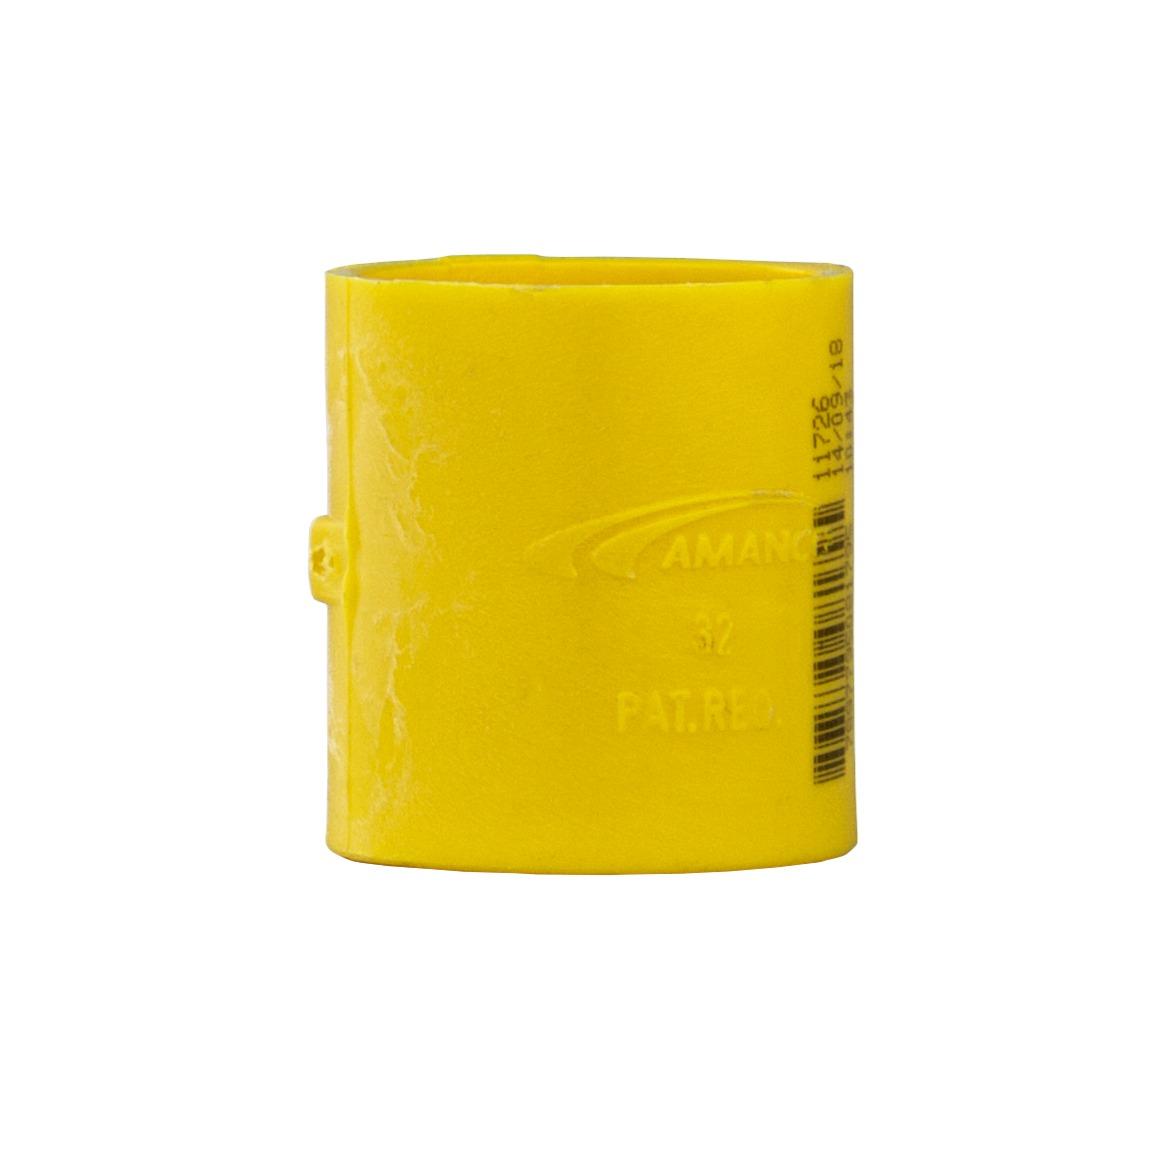 Luva Pressao 1 PVC Antichamas Amarelo - Amanco